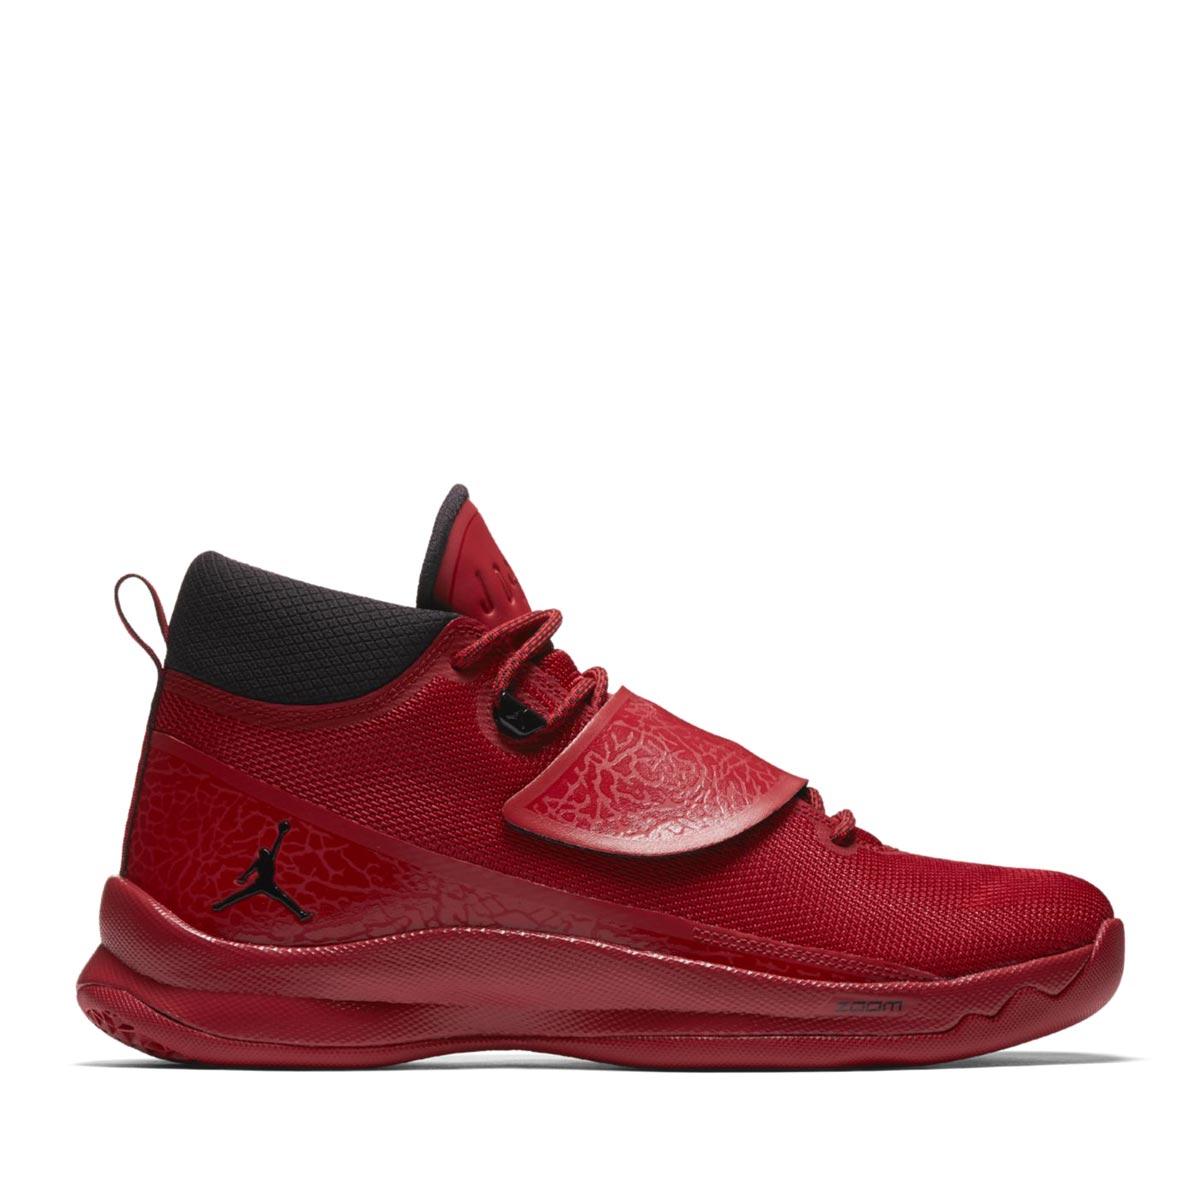 pretty nice c8e9a e7933 NIKE JORDAN SUPER.FLY 5 PO (Nike Jordan super fly 5 PO) GYM RED BLACK-GYM  RED 17SP-I